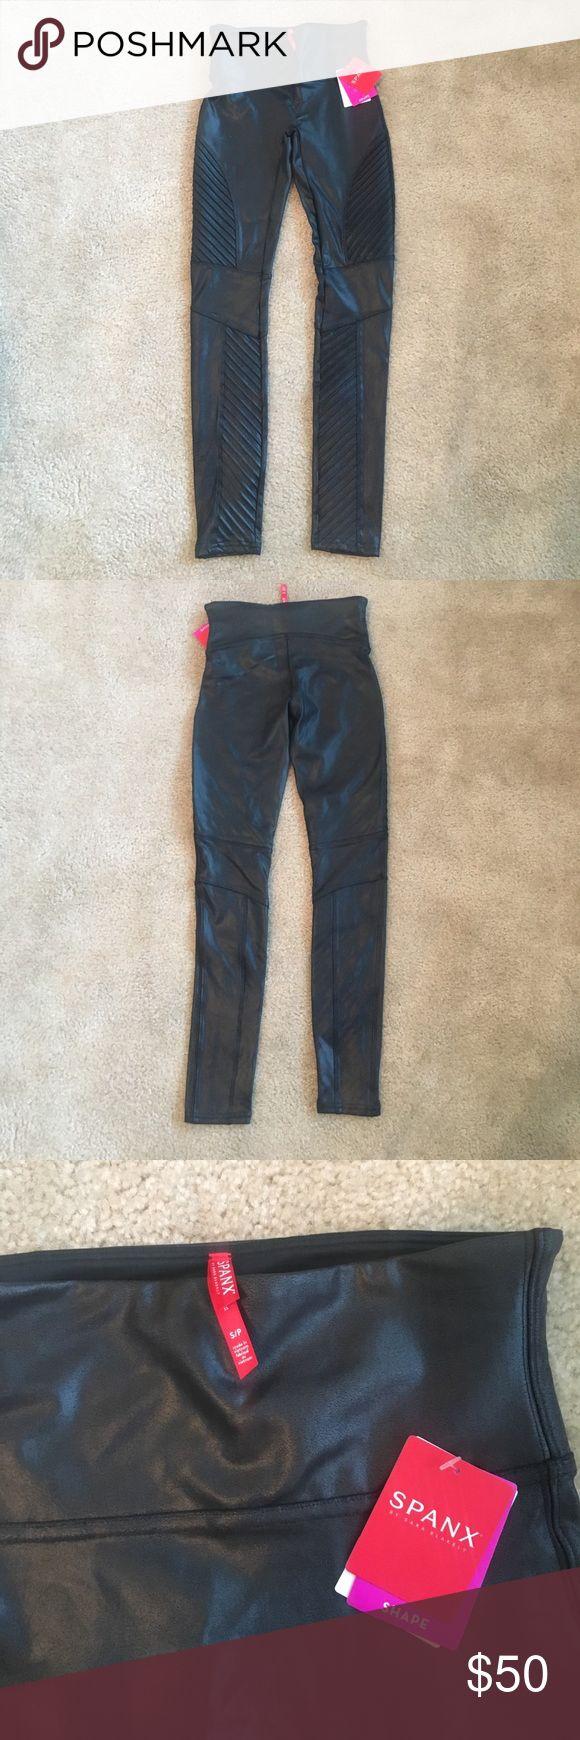 Spanx Black Faux Leather Moto Leggings Brand new with tags. Spanx Black Faux leather moto leggings. Size small SPANX Pants Leggings